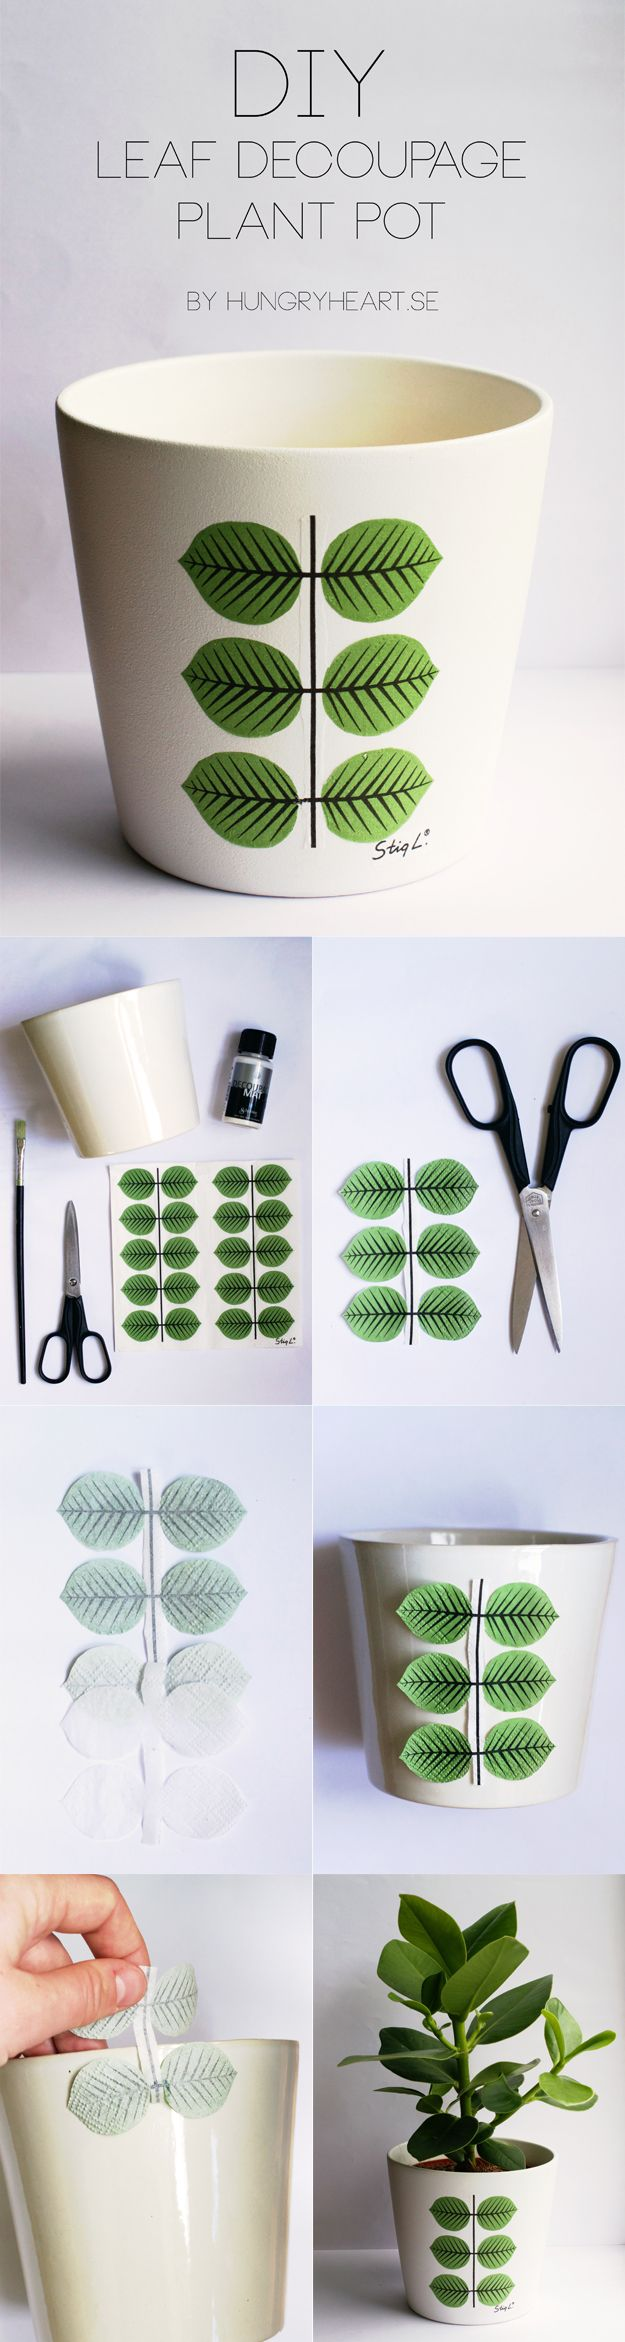 DIY Leaf Decoupage Plant Pot Step by Step Tutorial | HungryHeart.se